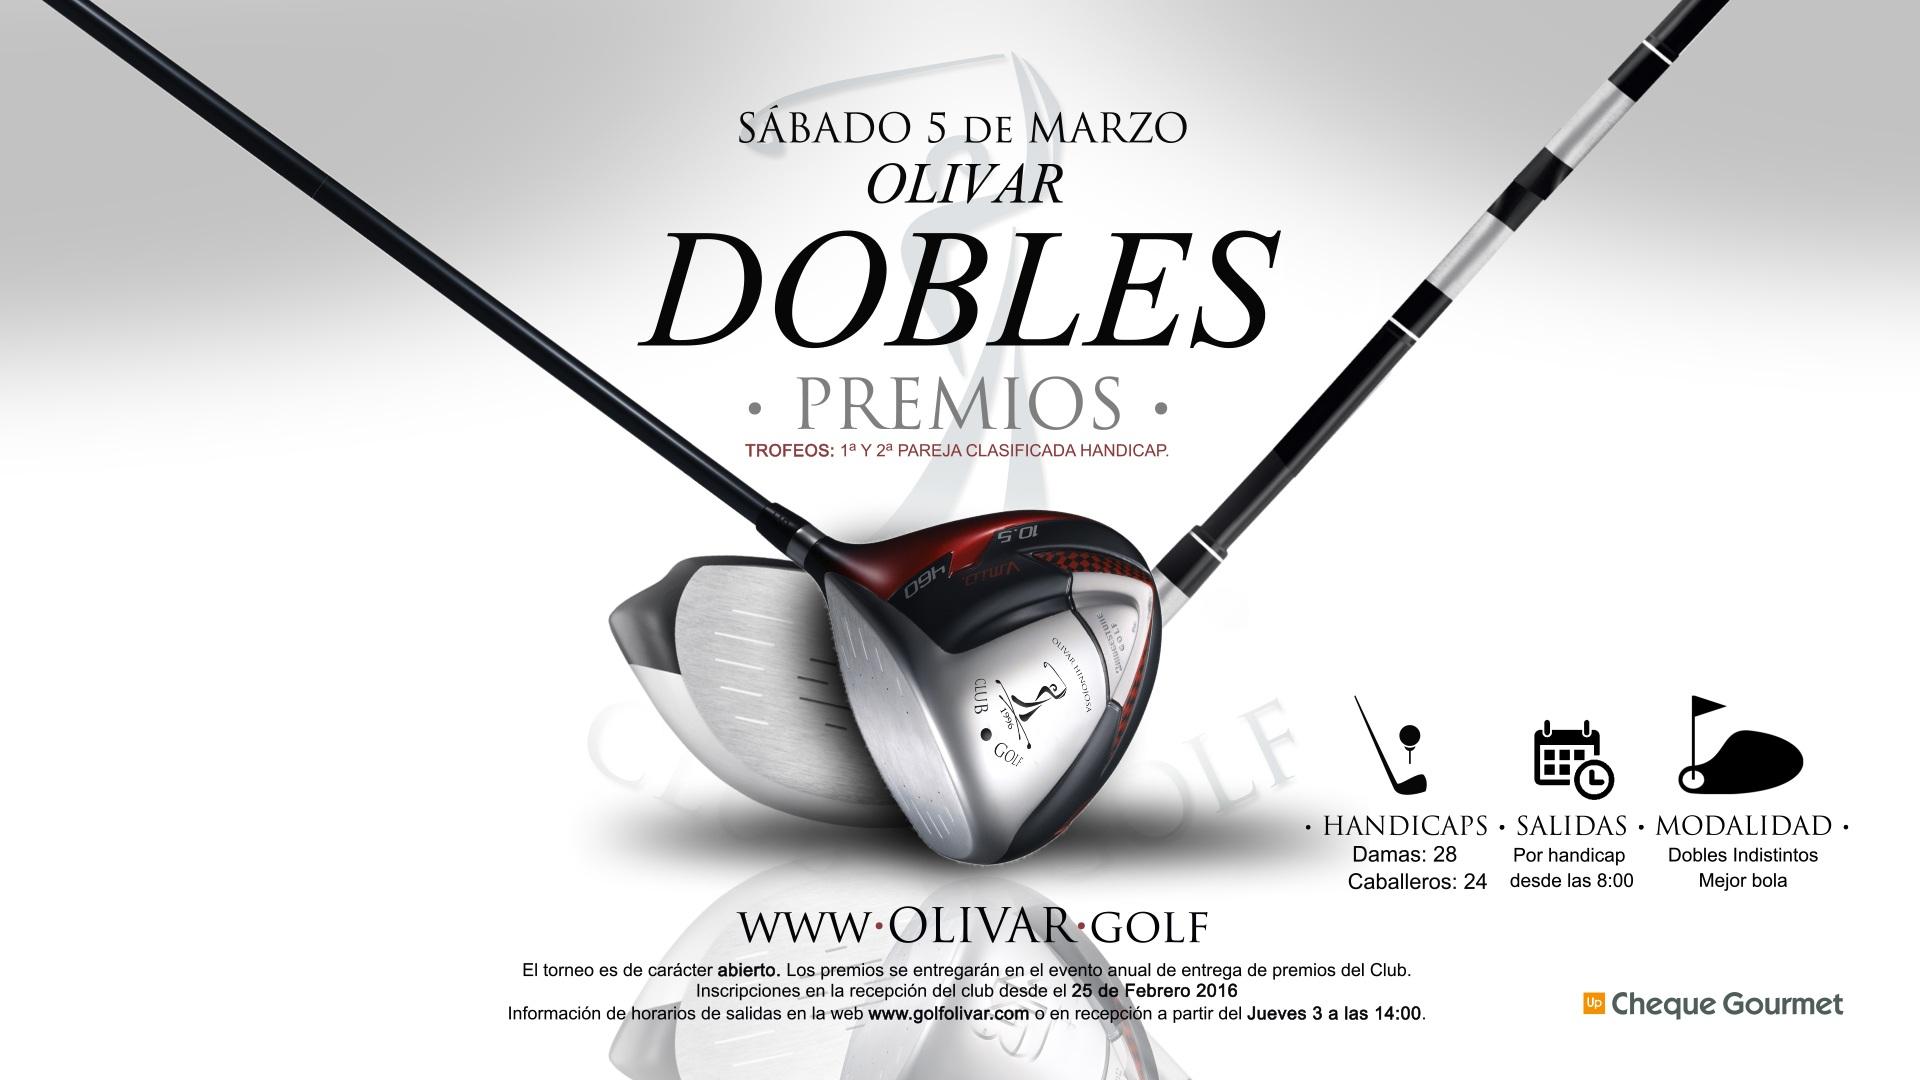 https://www.perfectpixel.es/wp-content/uploads/2016/02/Torneo-de-Dobles-Olivar-Hinojosa-Cartel-by-PerfectPixel-Publicidad-Teles.jpg